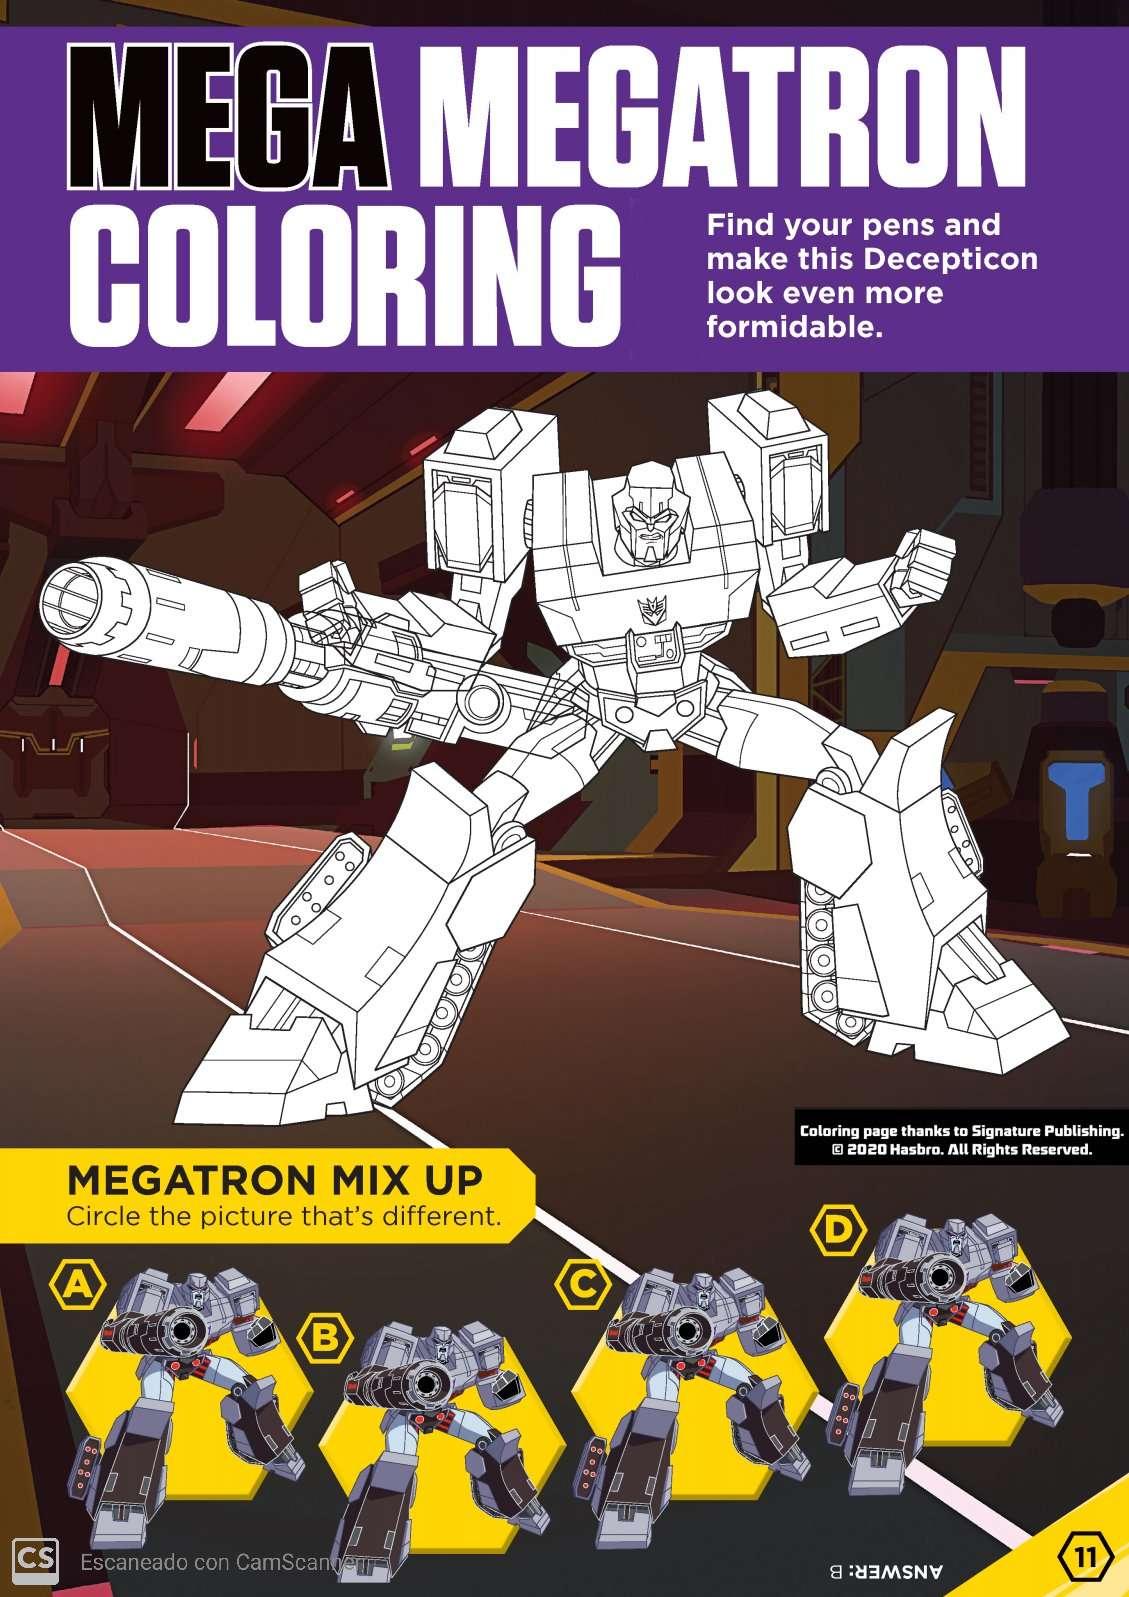 Hasbro S Bring Home The Fun Free Printable Mega Megatron